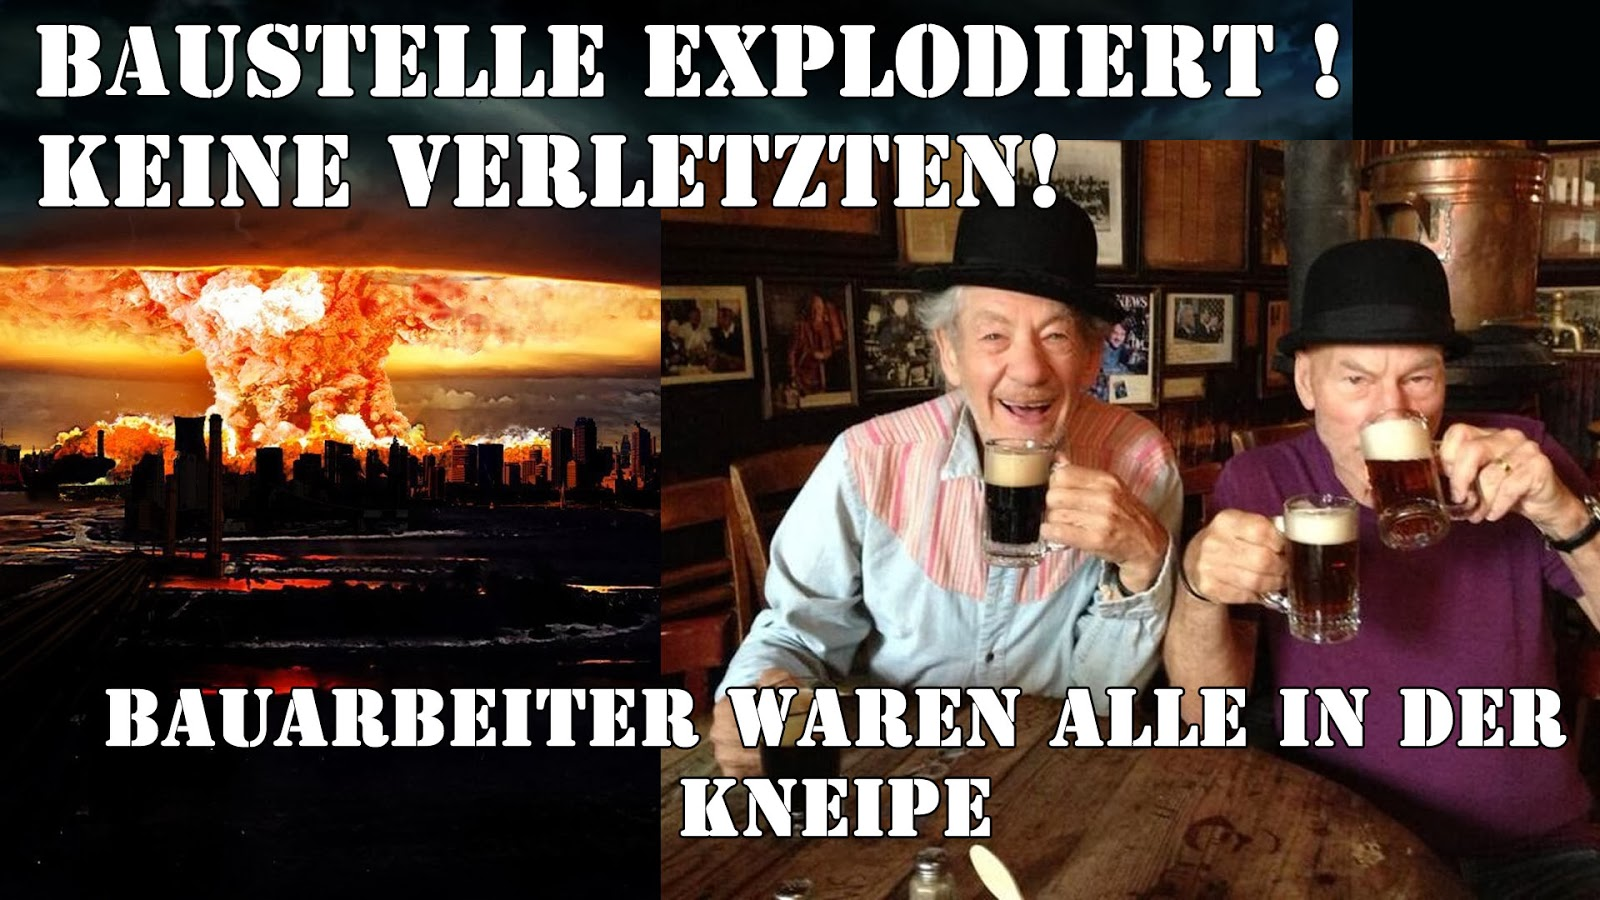 Baustelle Arbeiter in Kneipe lustige Humor Bilder Satire